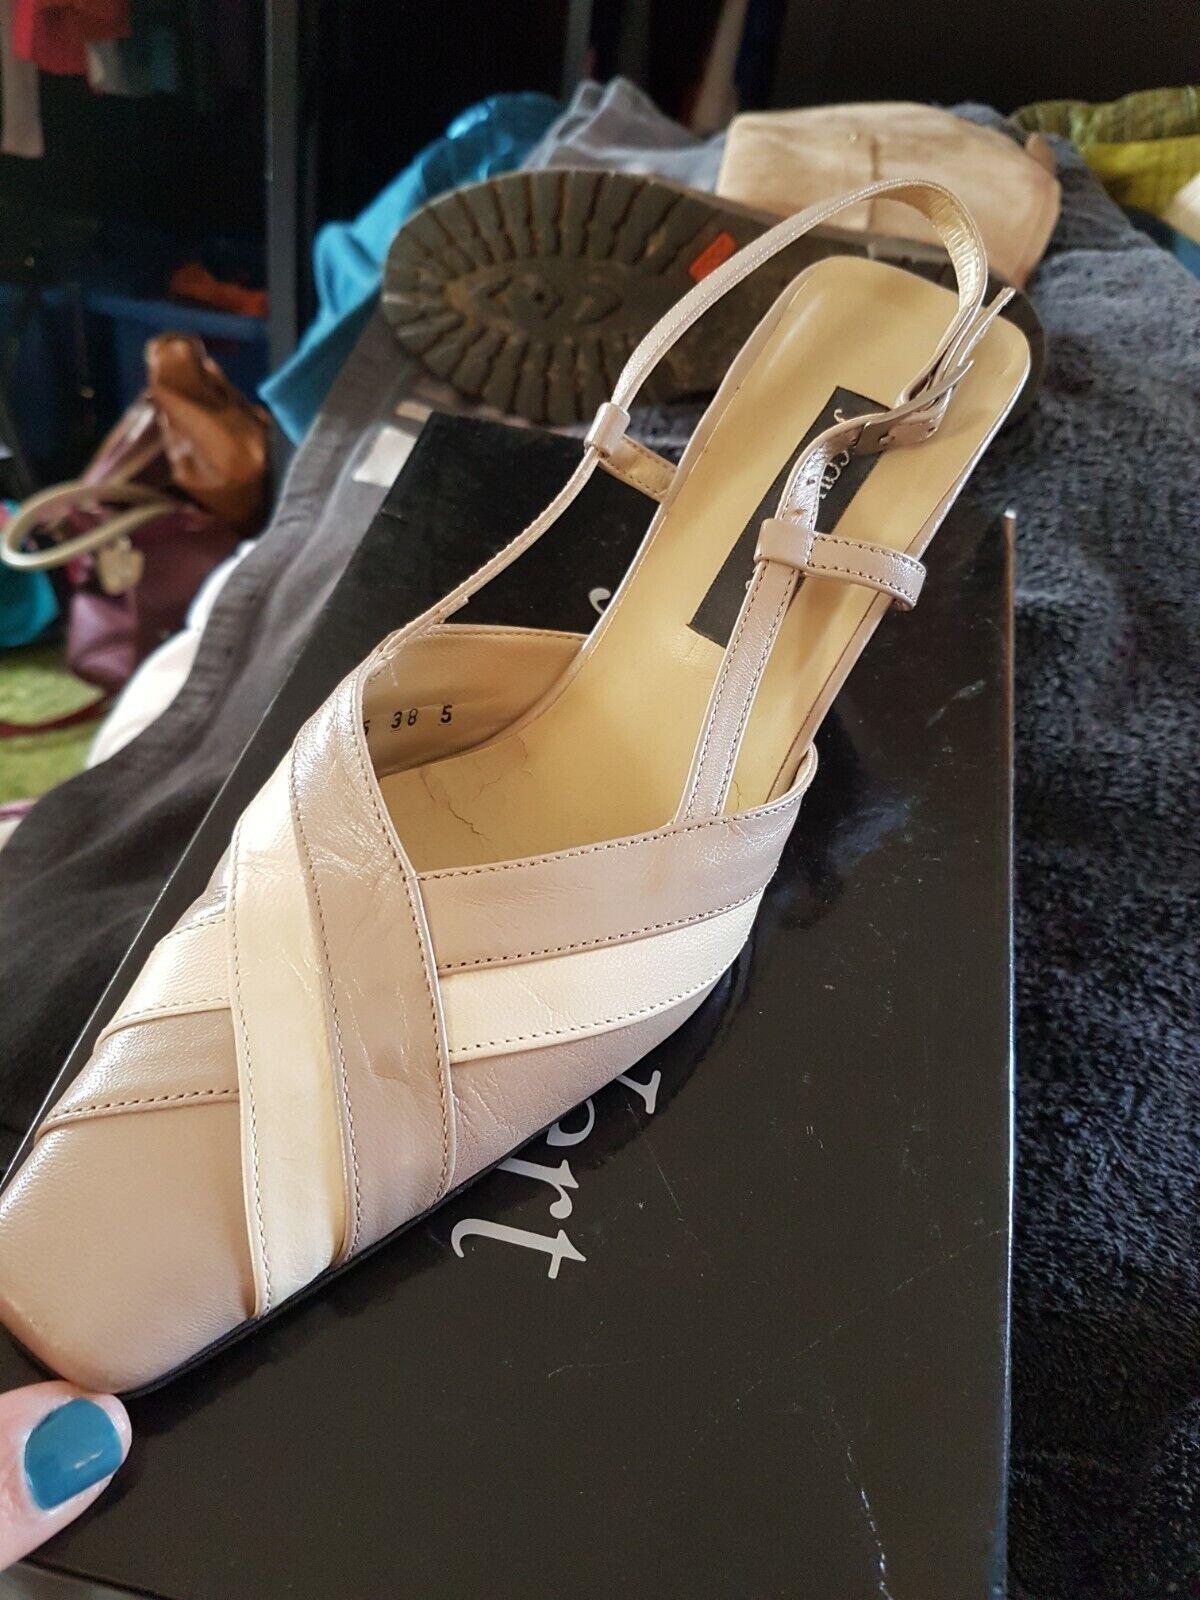 Jacques vert shoes matching bag